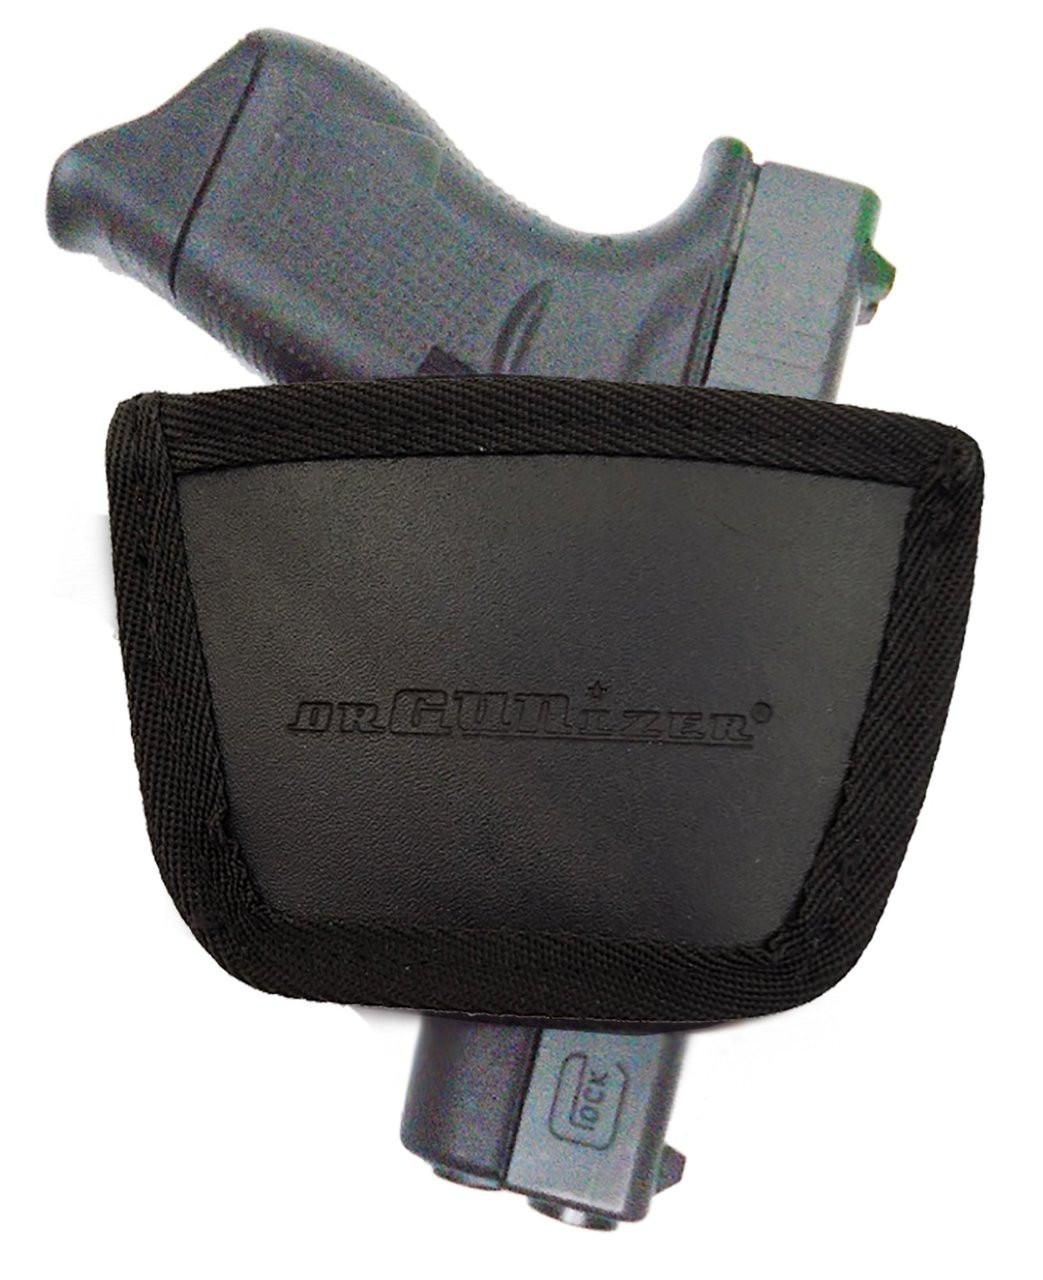 Garrison Grip Leather Inside and Outside Waistband Easy Slide Holster Fits Glock 43 Black